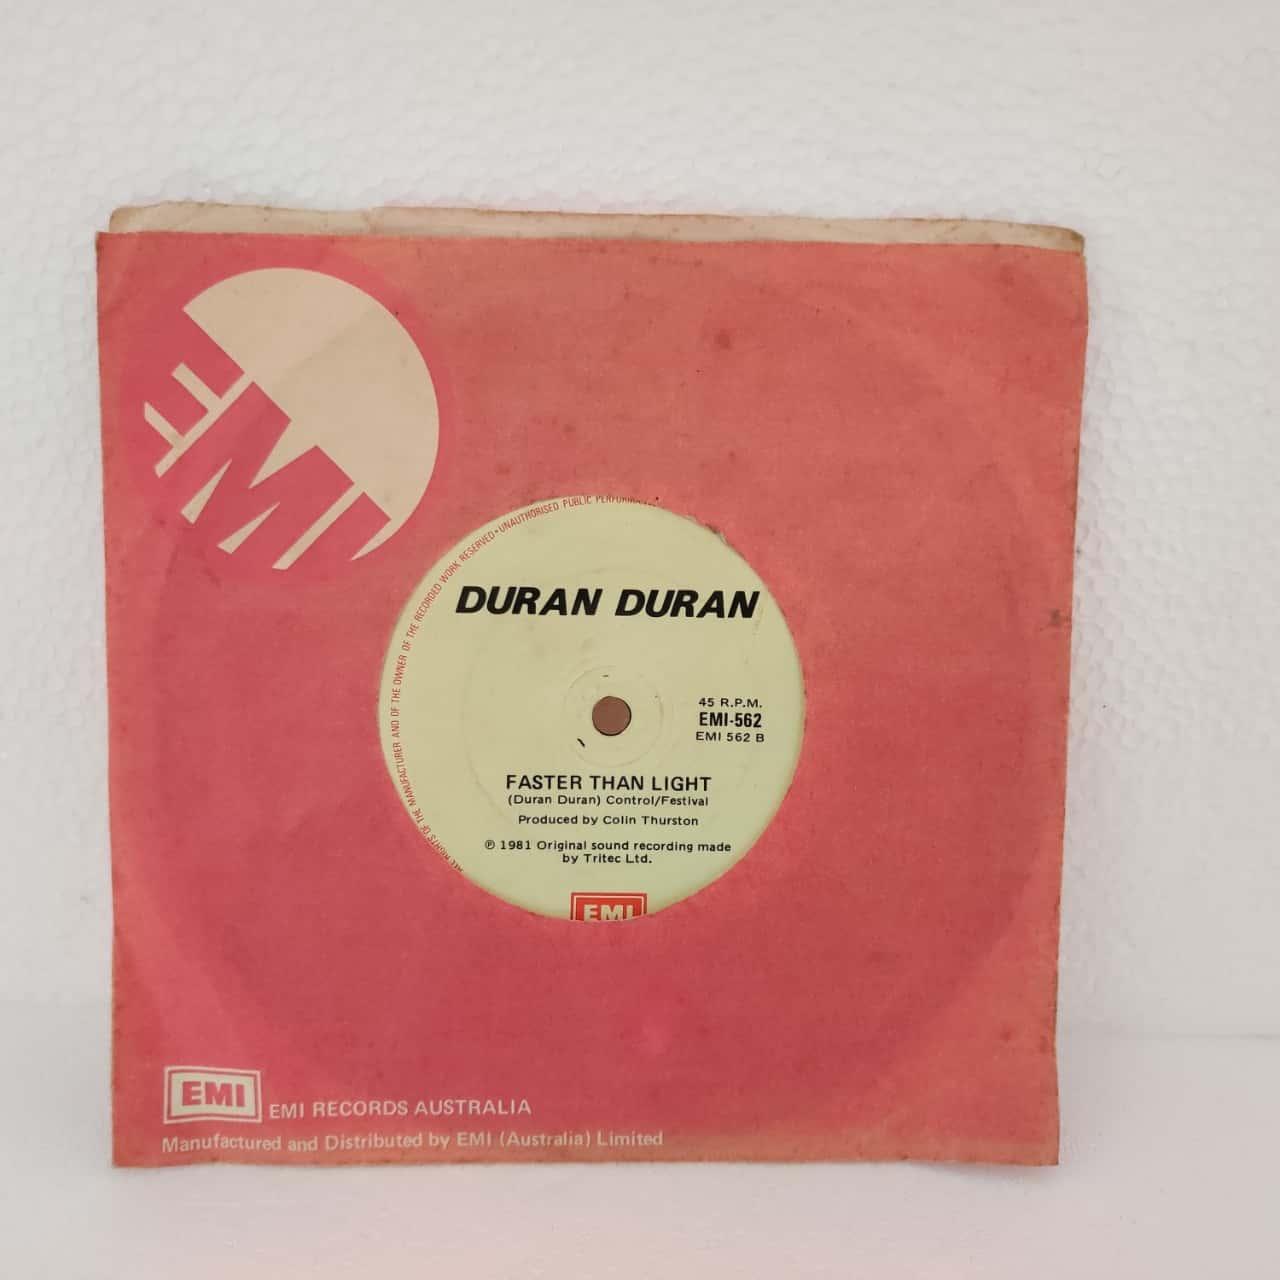 "7"" Single Vinyl Record - Duran Duran - Girls On Film"